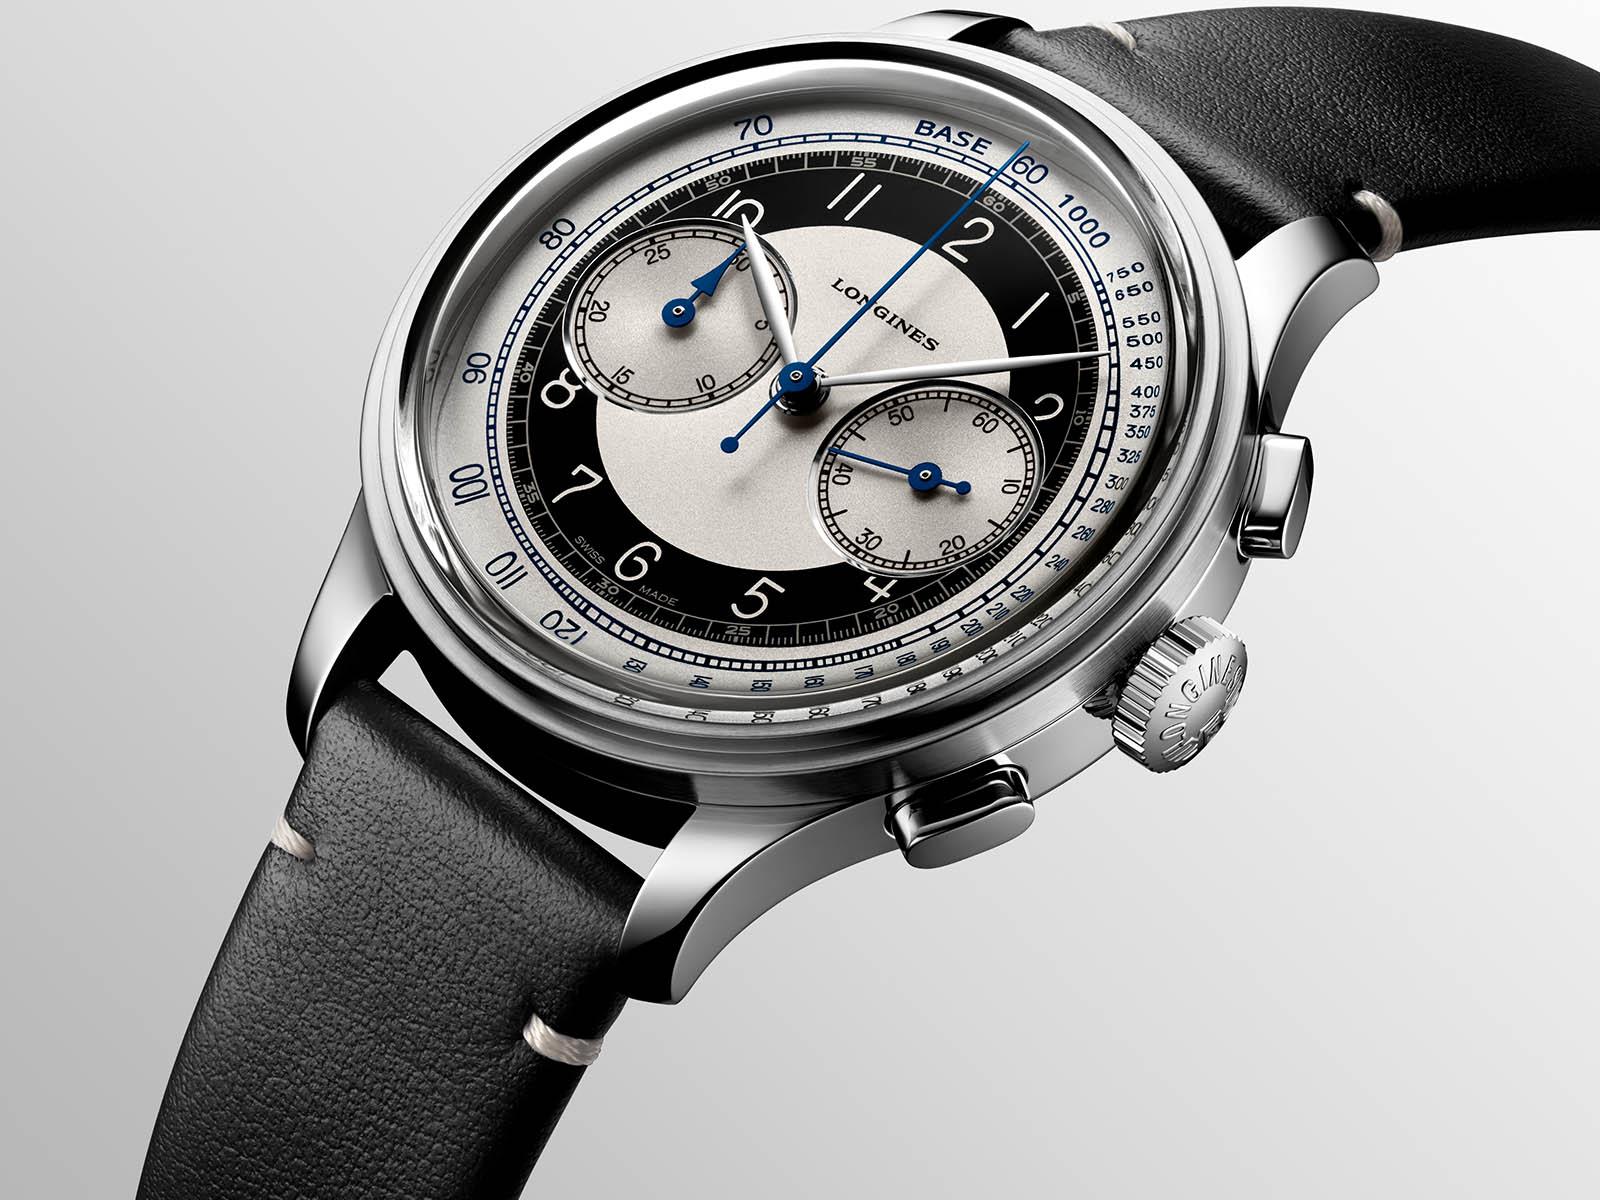 l2-830-4-93-0-longines-heritage-classic-chronograph-5.jpg